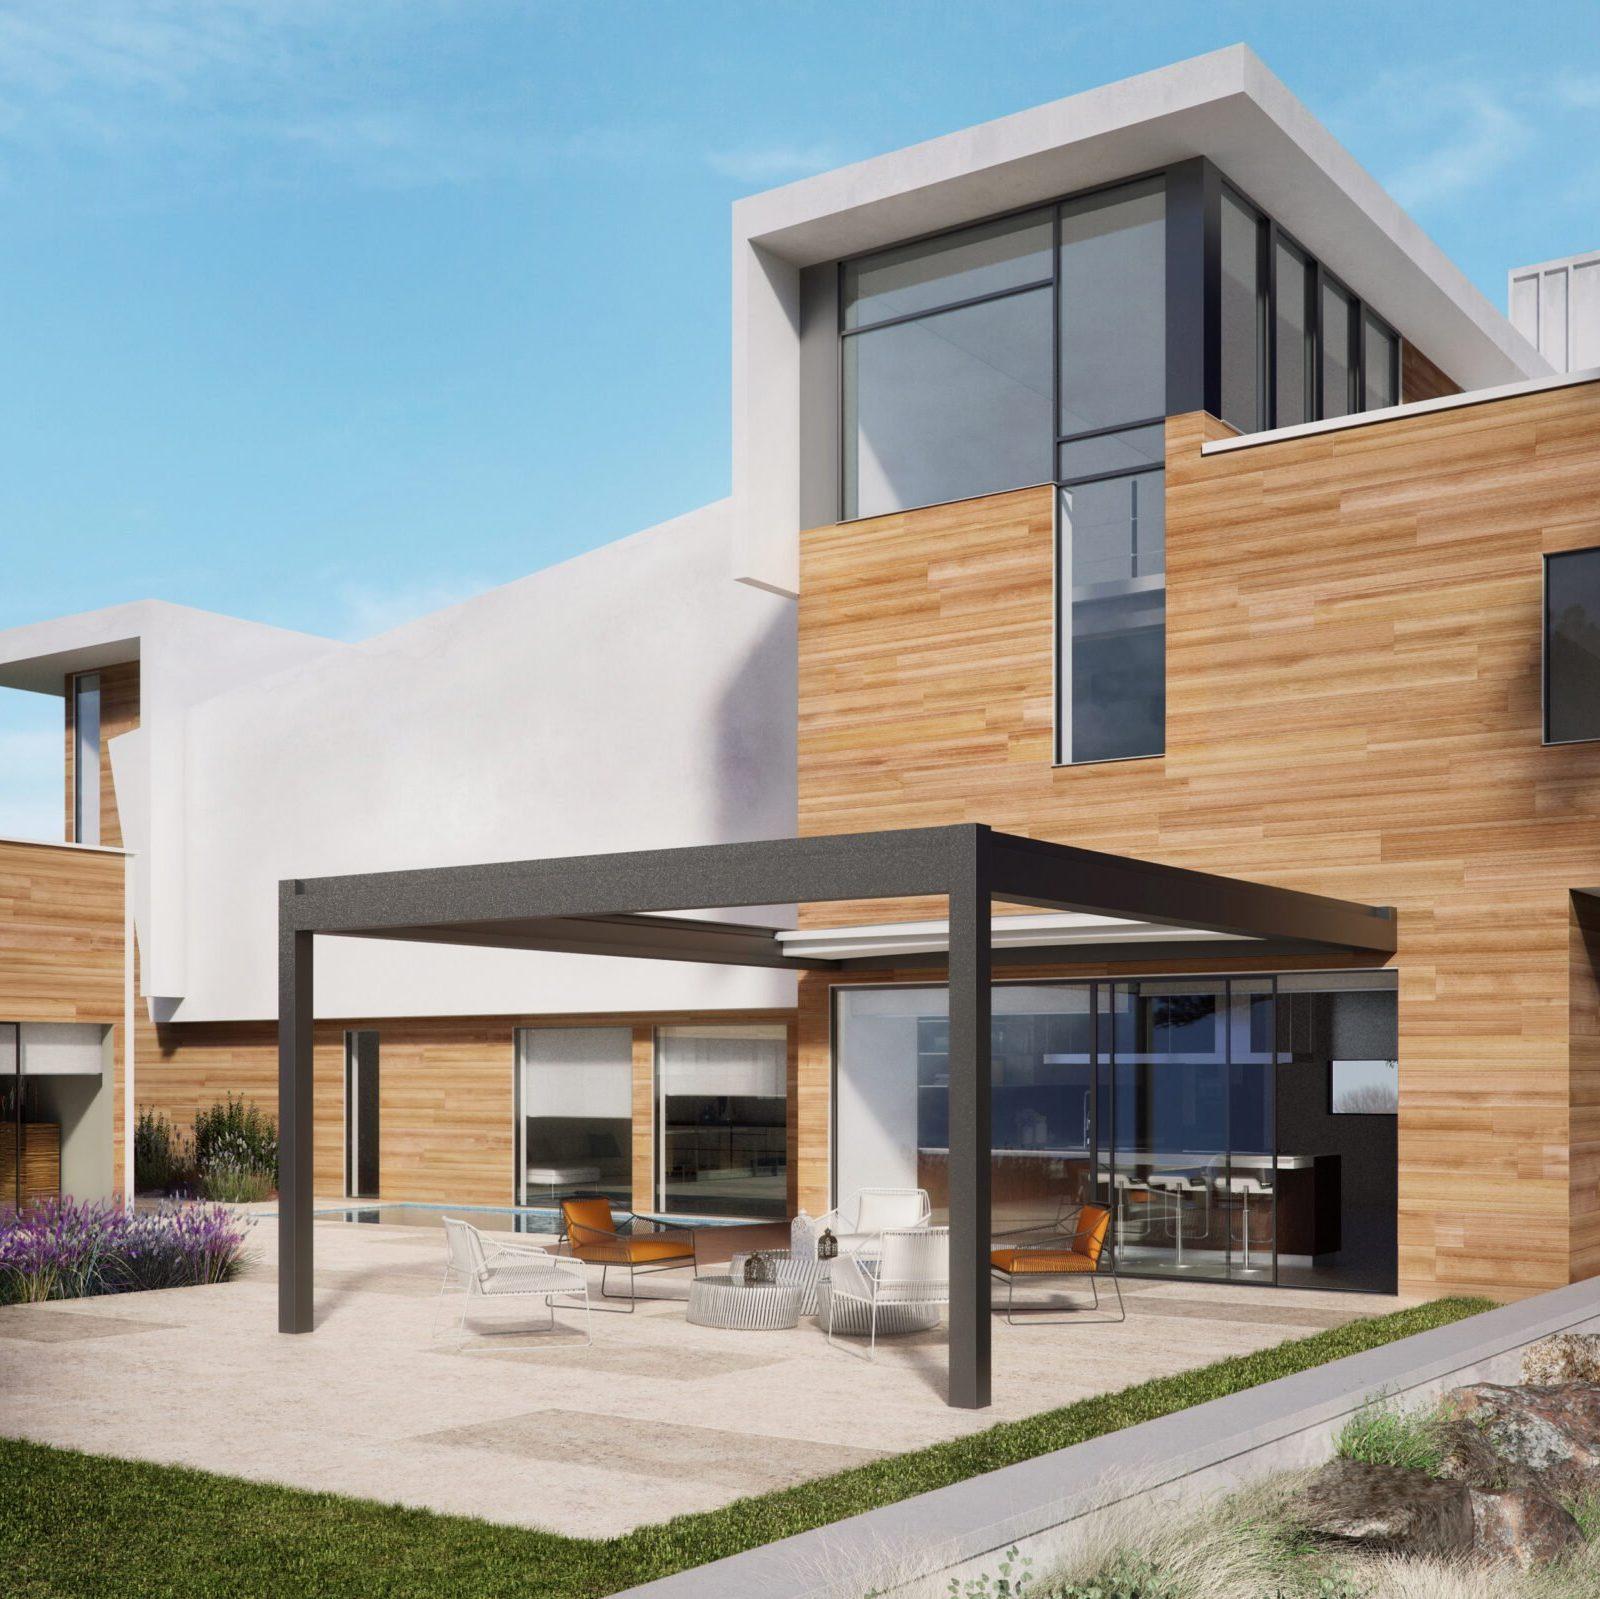 Nomo Retractable Roof Structure